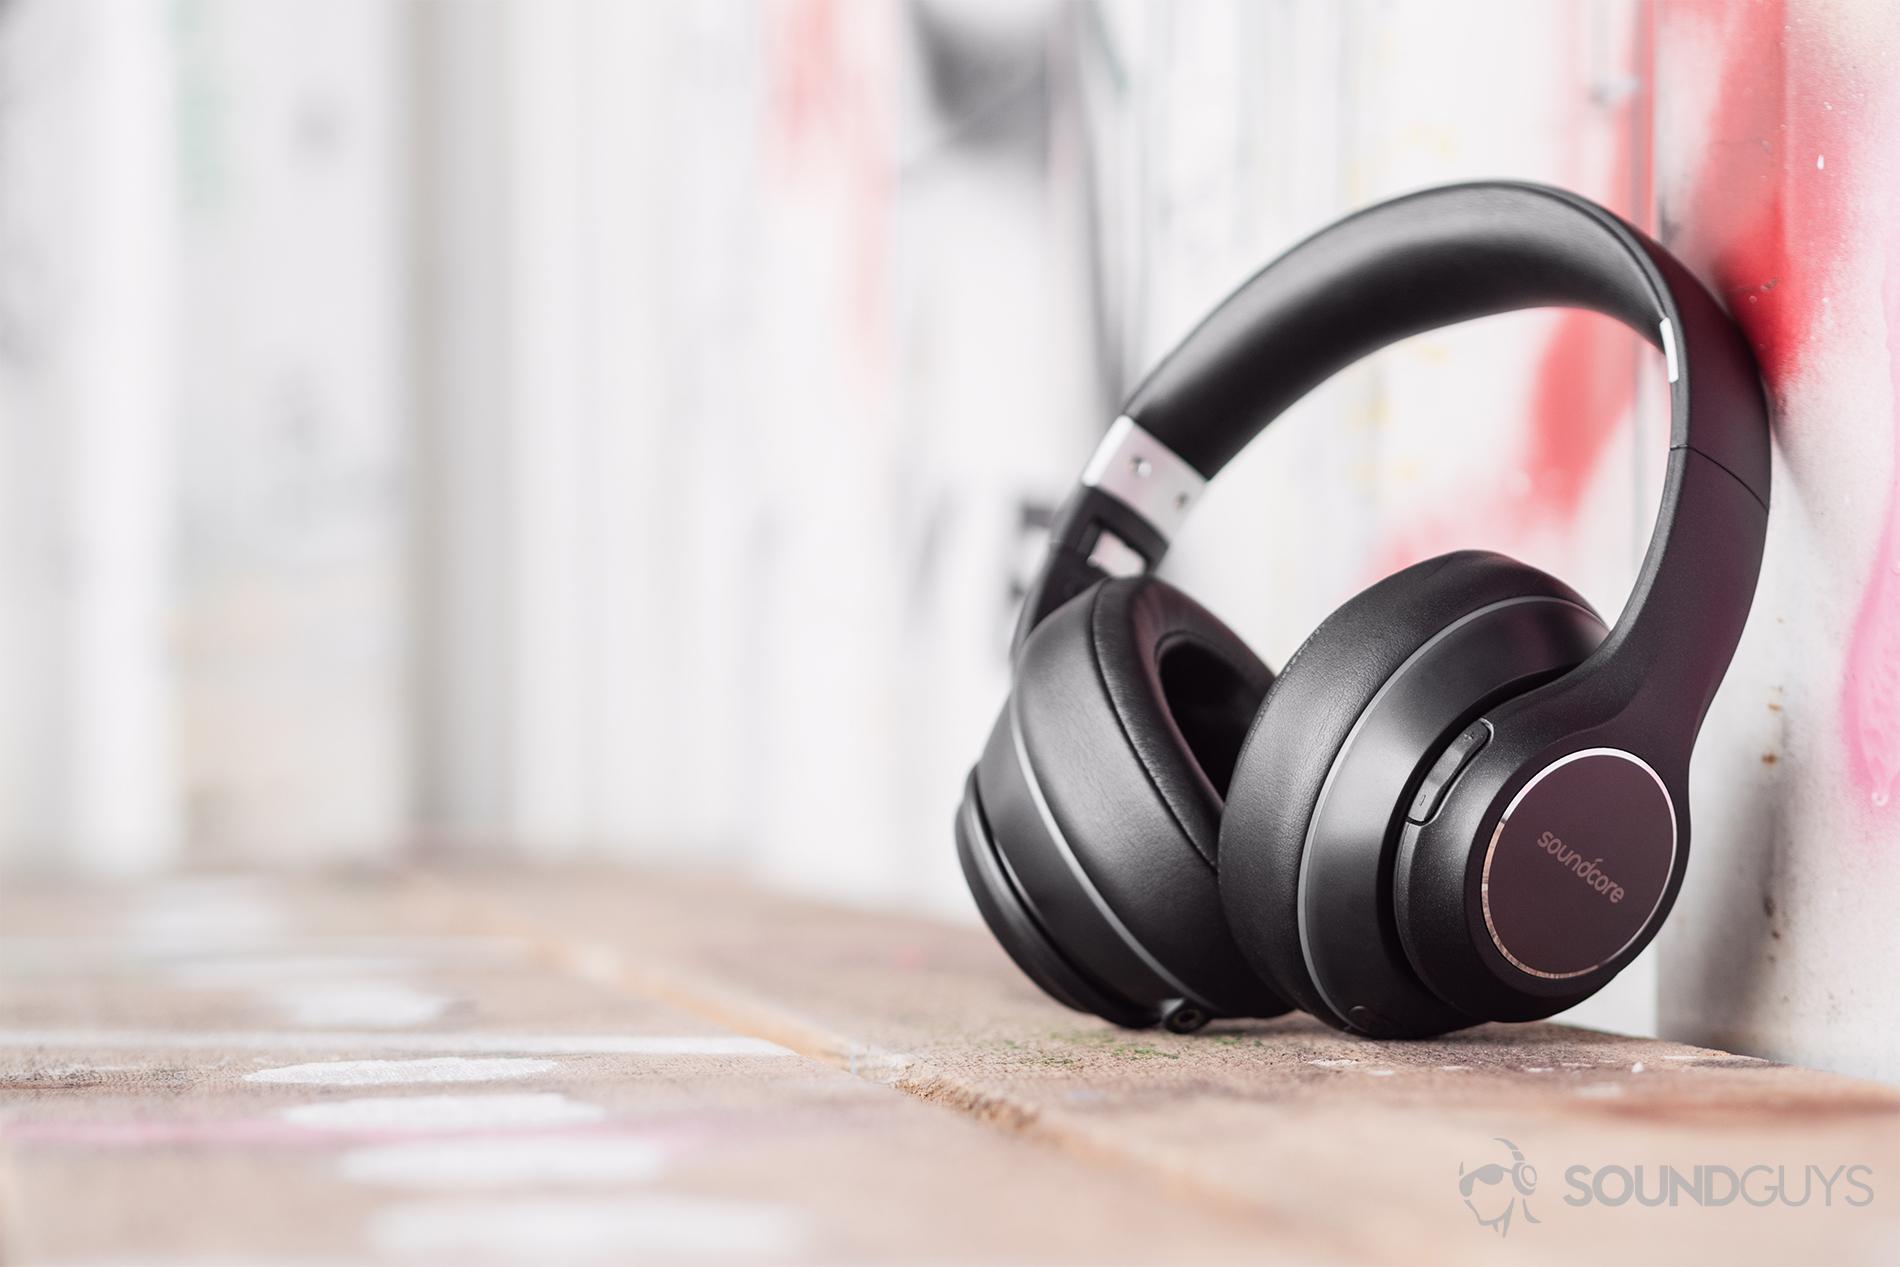 Anker Soundcore Vortex review: Huge value, low price